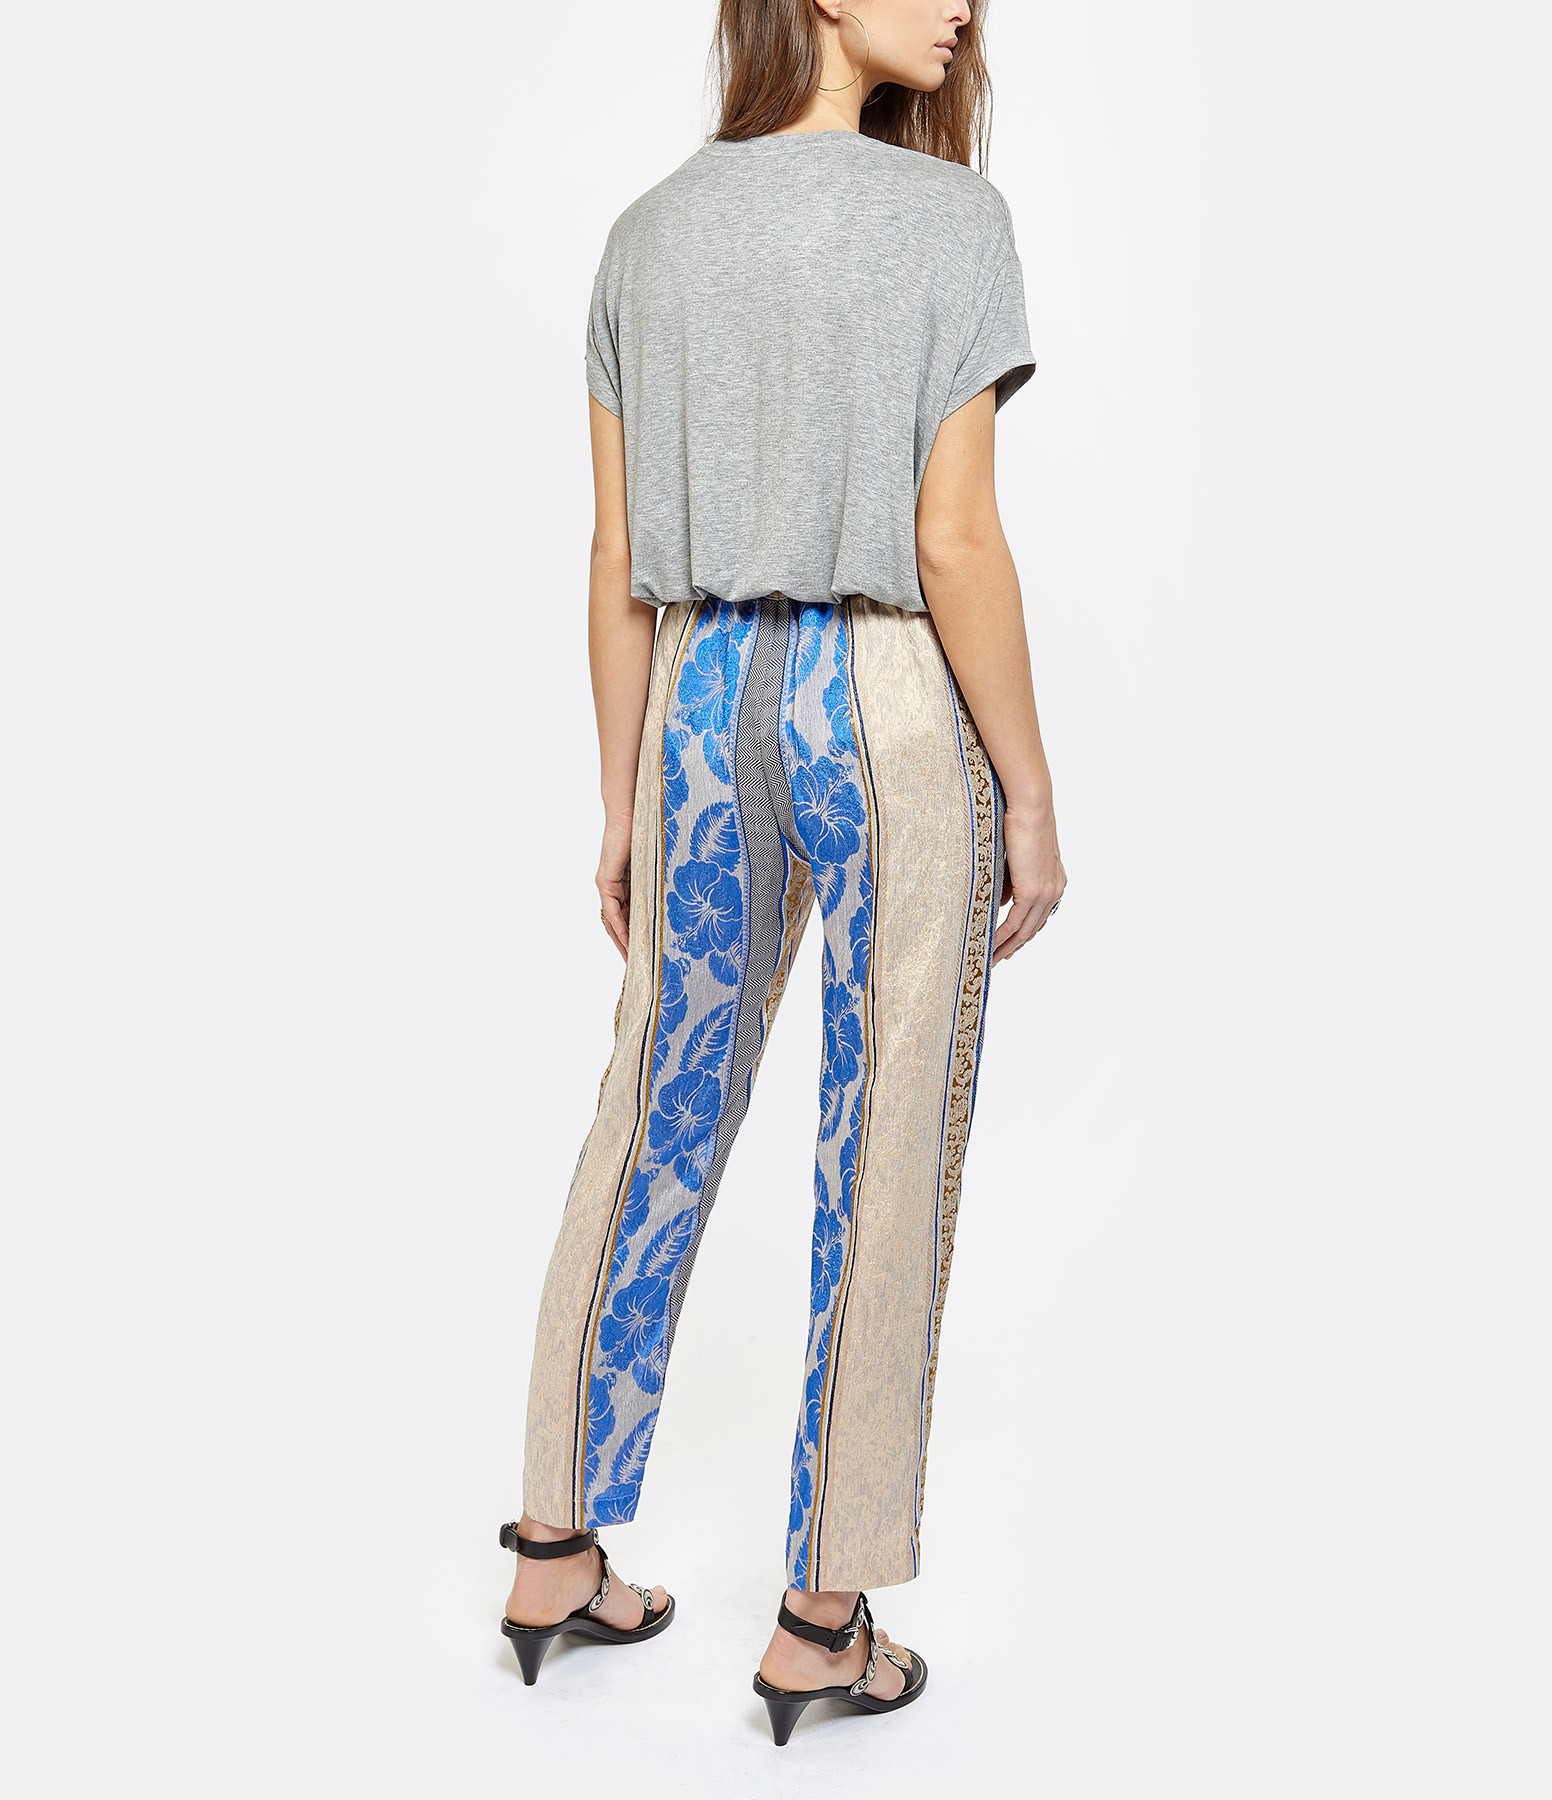 MARGAUX LONNBERG - Tee-shirt Marlow Coton Gris